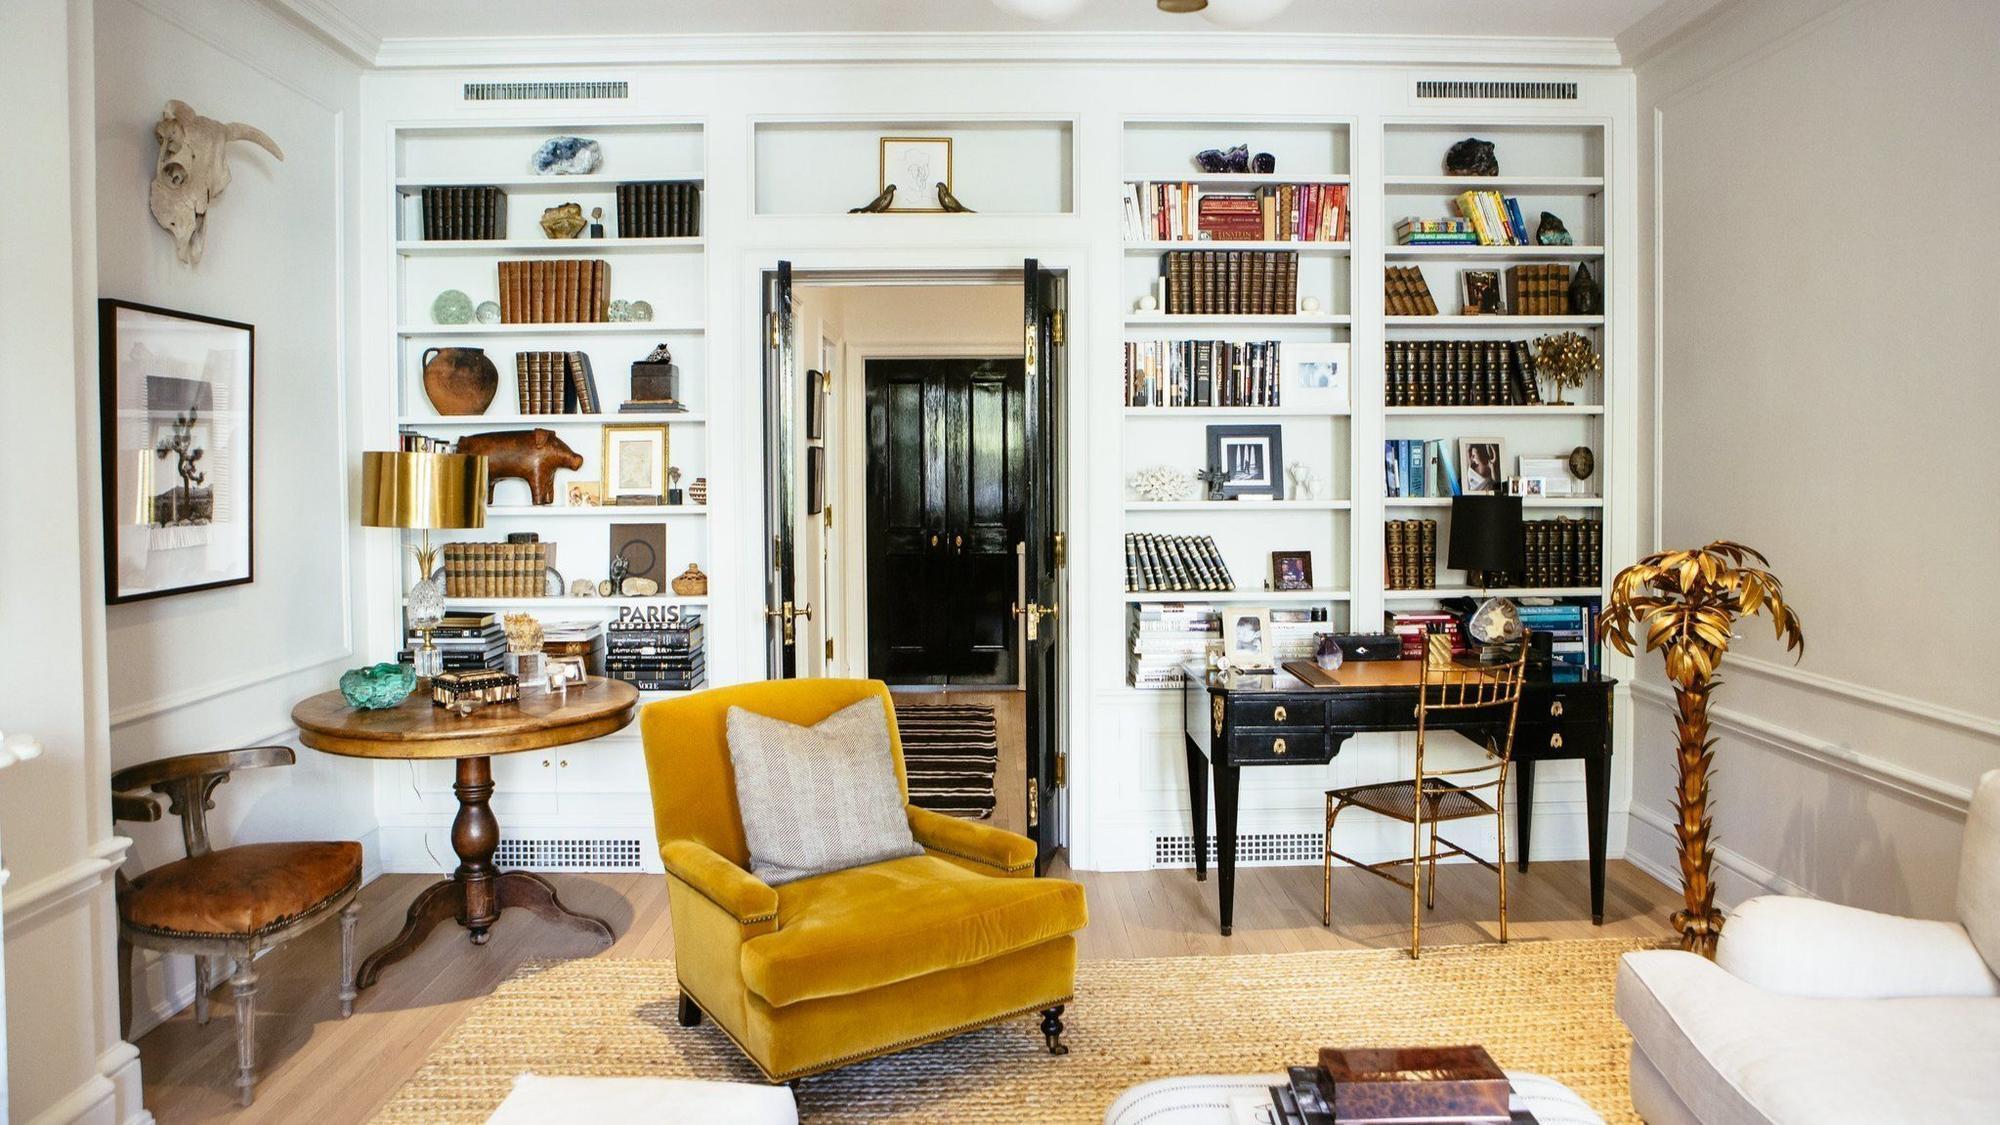 Nate Berkus' 8 greatest tips for effortless home style ...